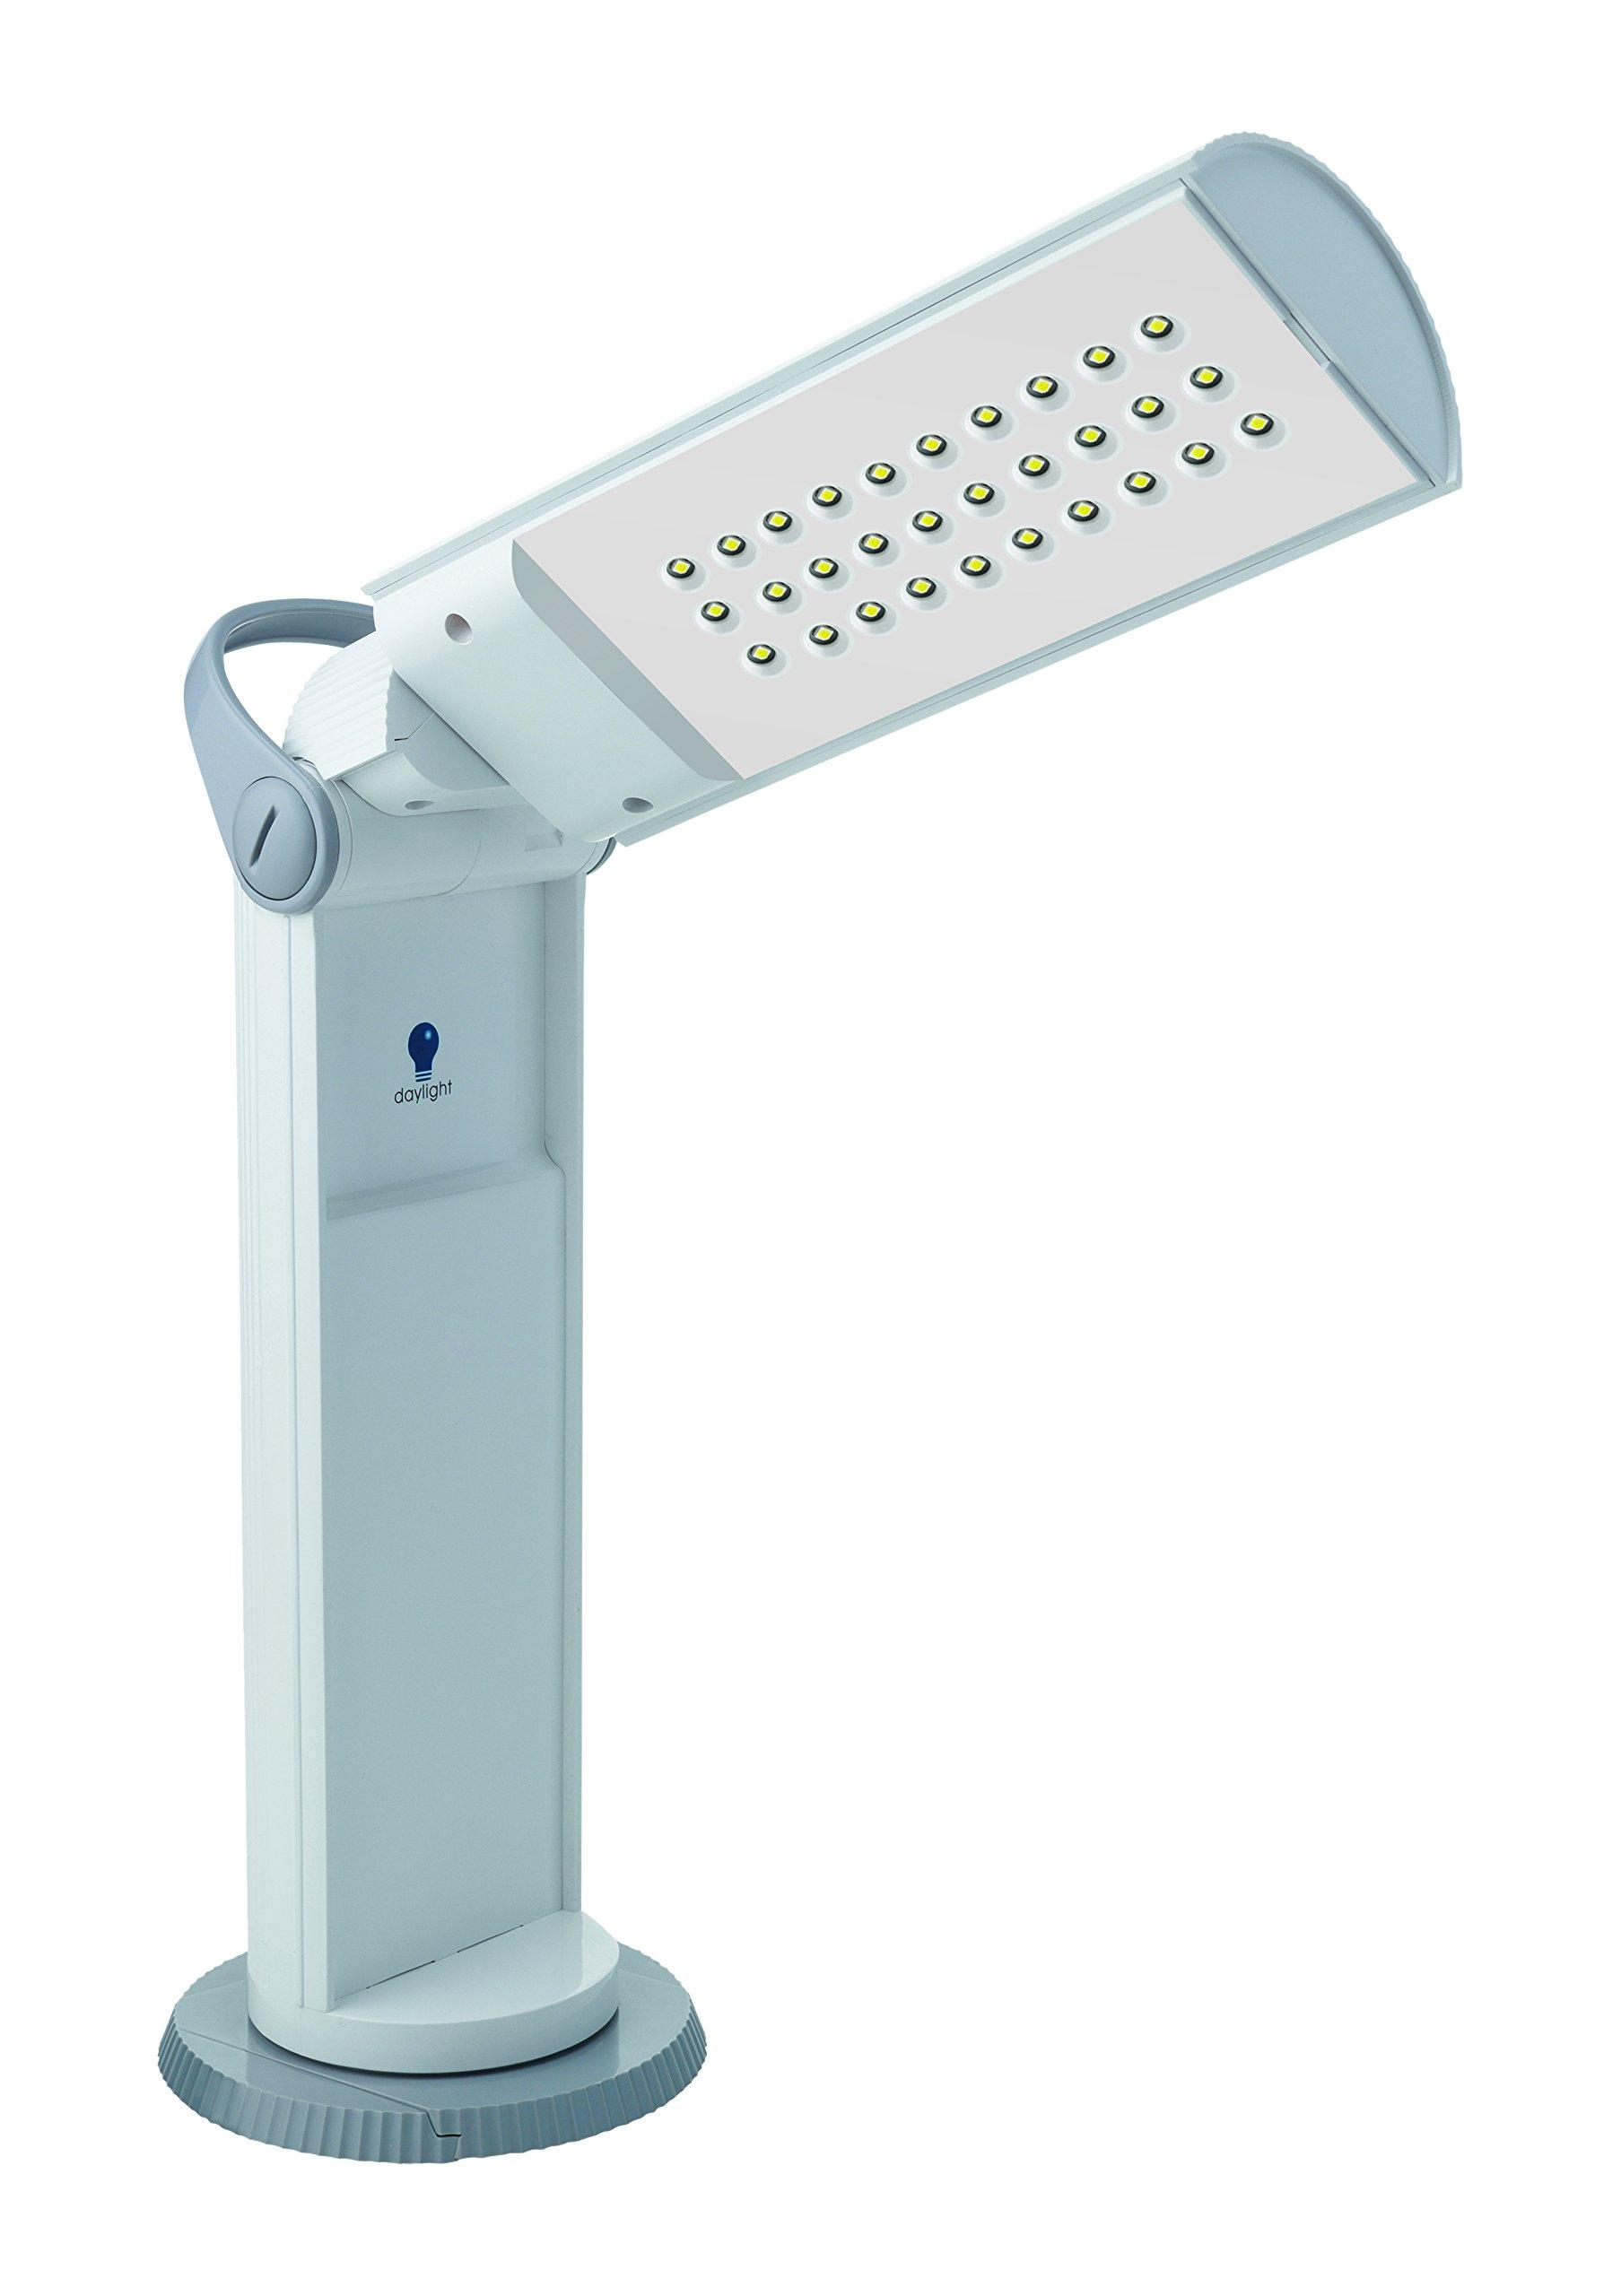 Daylight Company U35700 Twist Portable LED Lamp, White